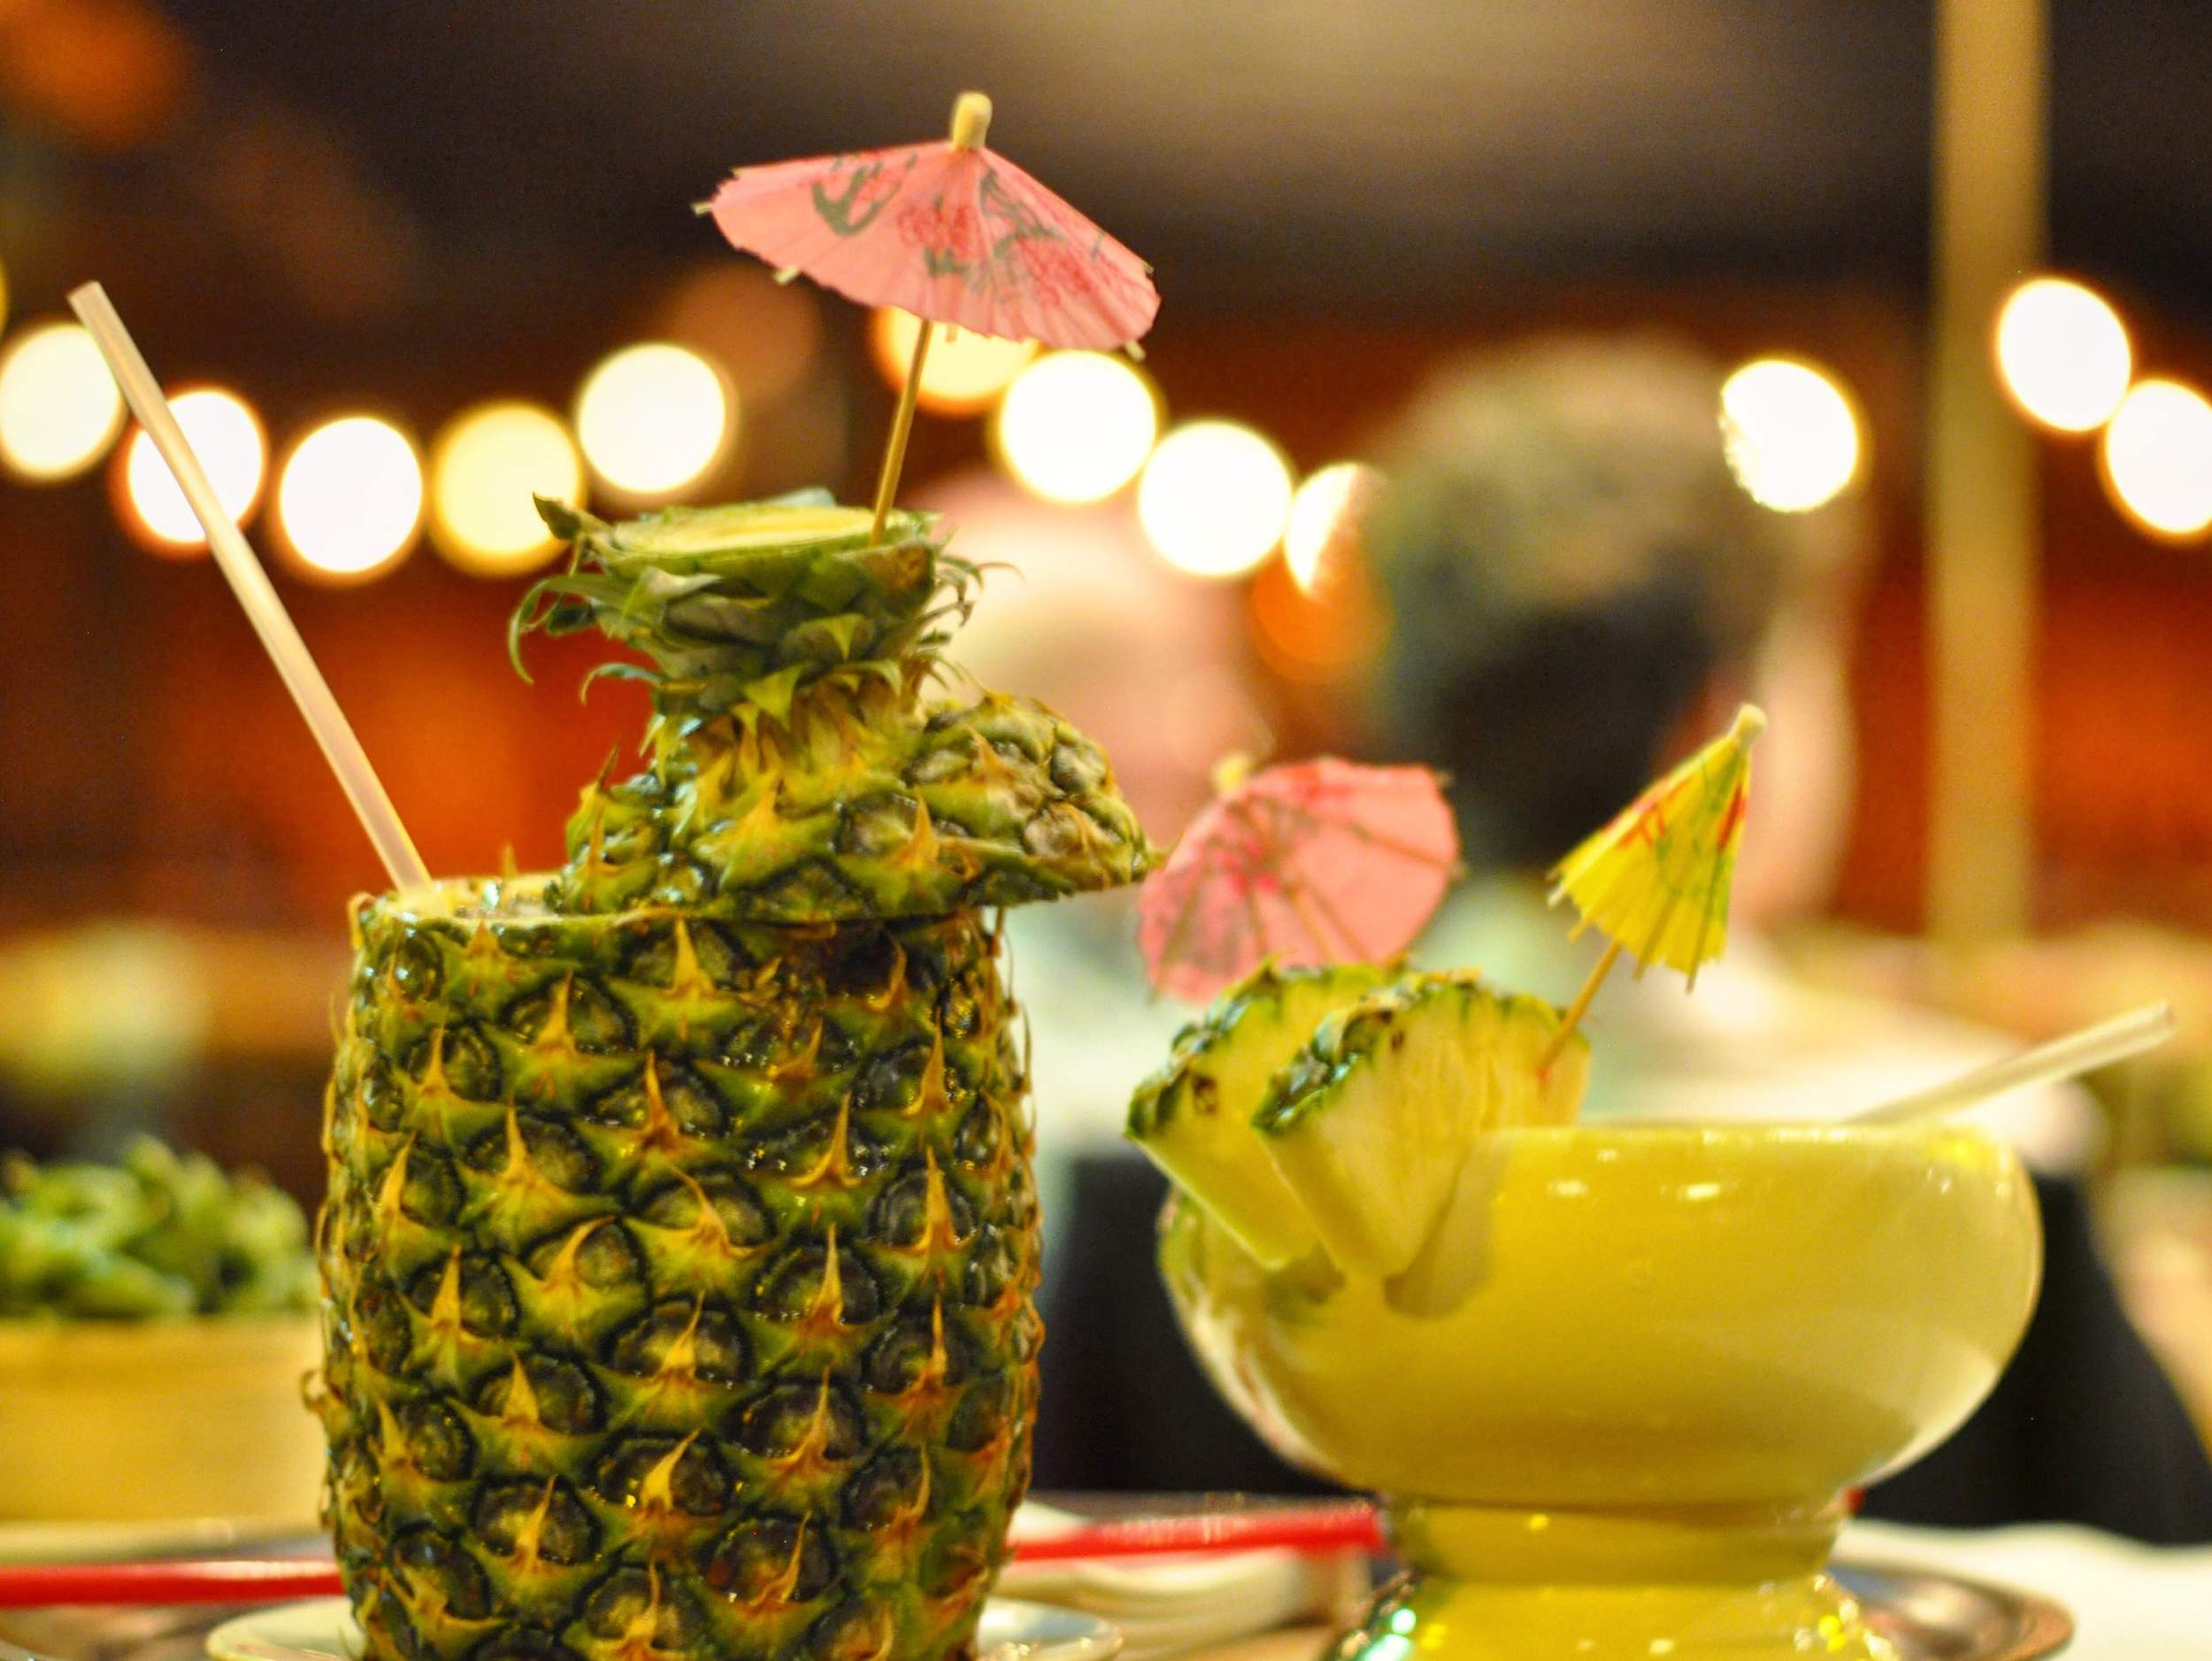 Festive tiki drinks at the Tonga Room